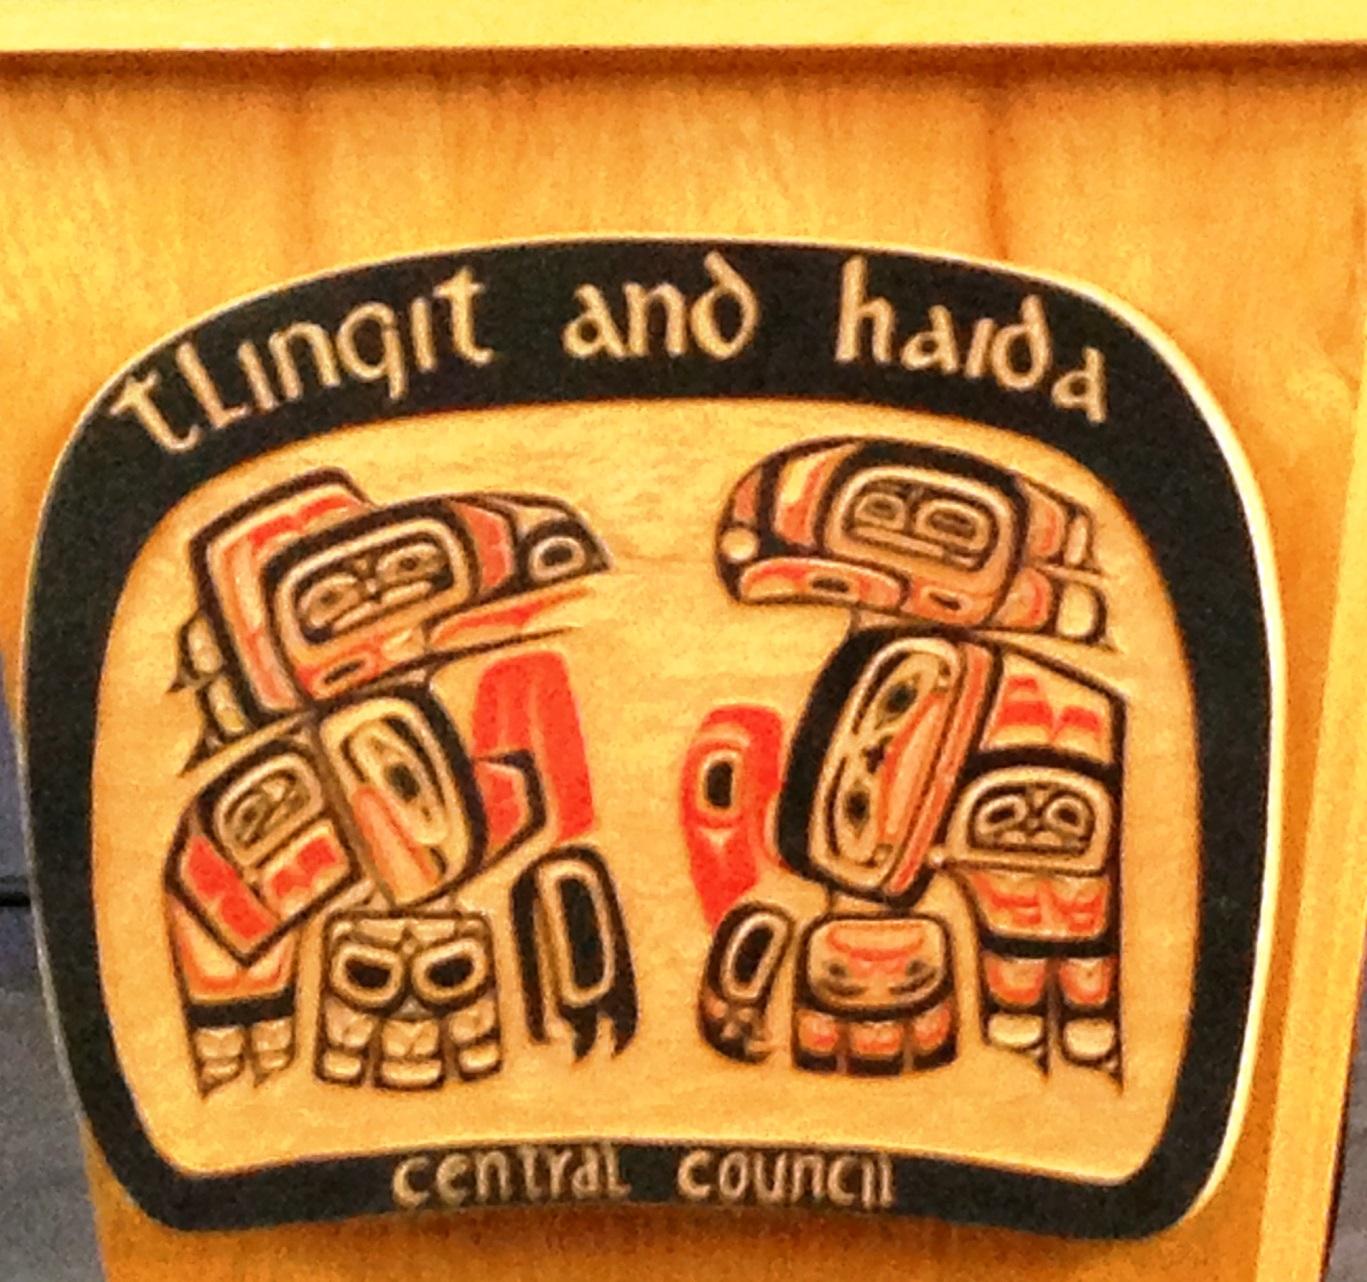 Tlingit-Haida Central Council OKs same-sex marriages